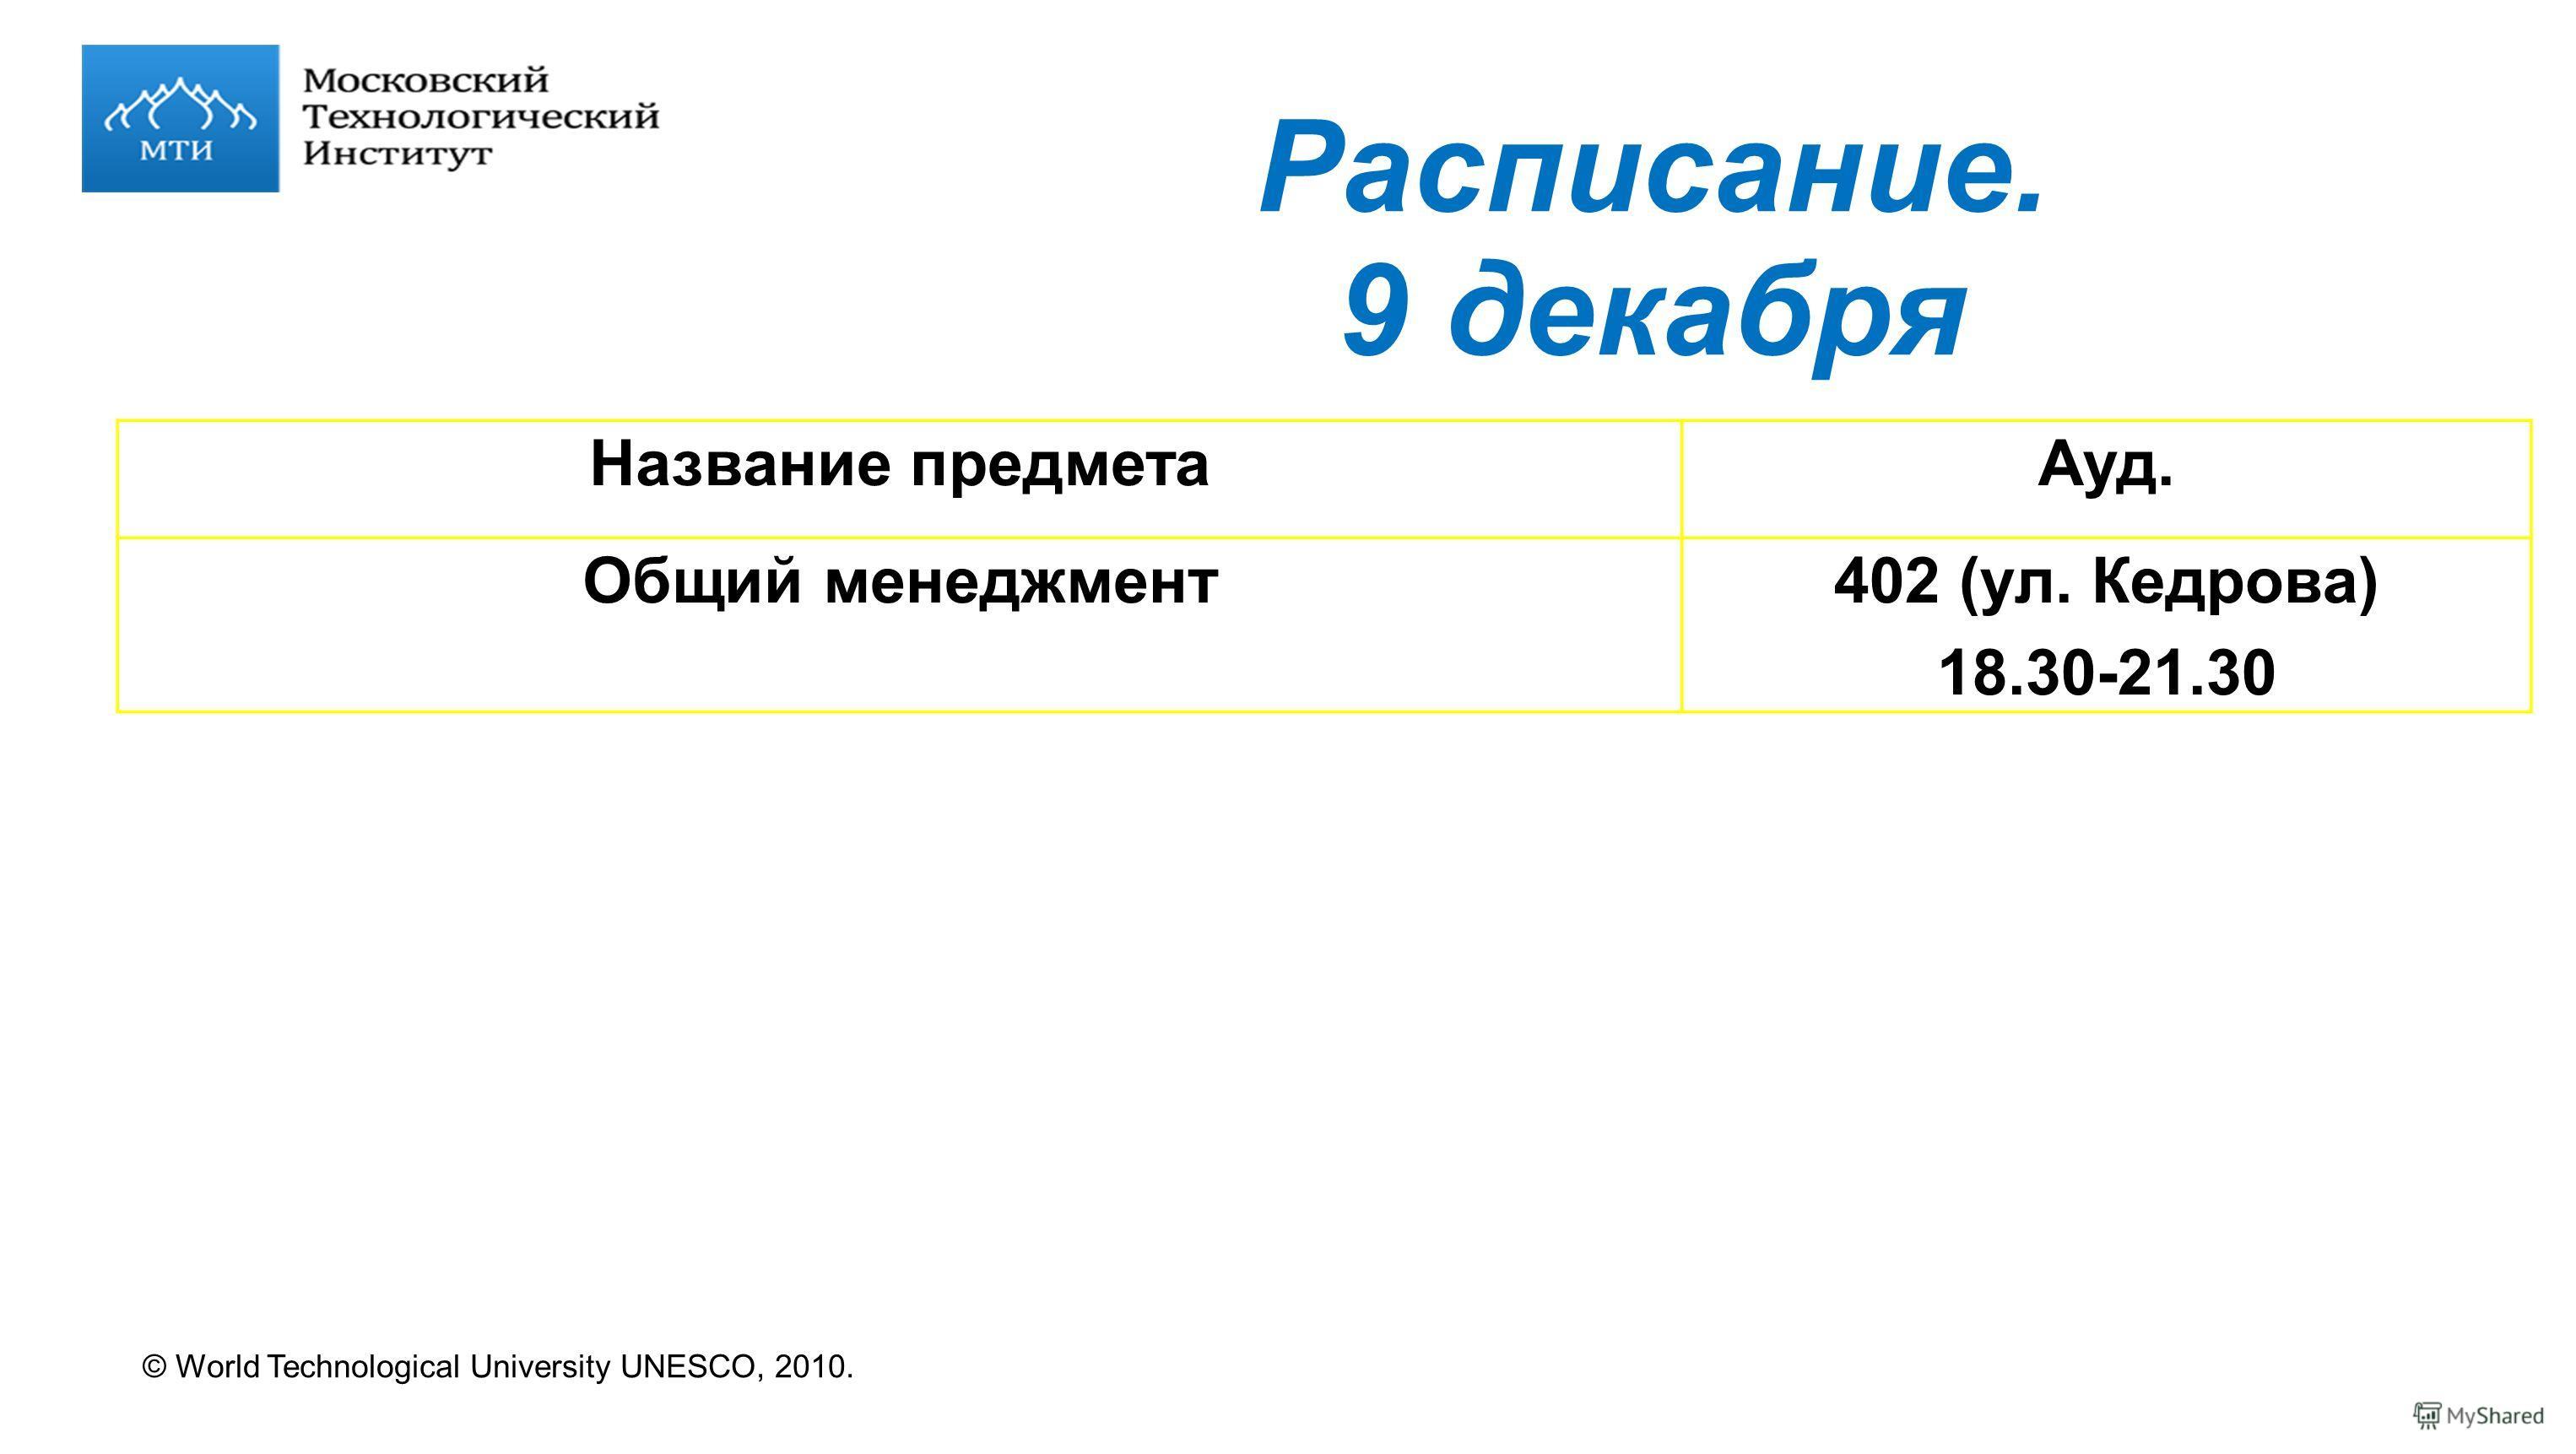 © World Technological University UNESCO, 2010. Расписание. 9 декабря Название предметаАуд. Общий менеджмент402 (ул. Кедрова) 18.30-21.30